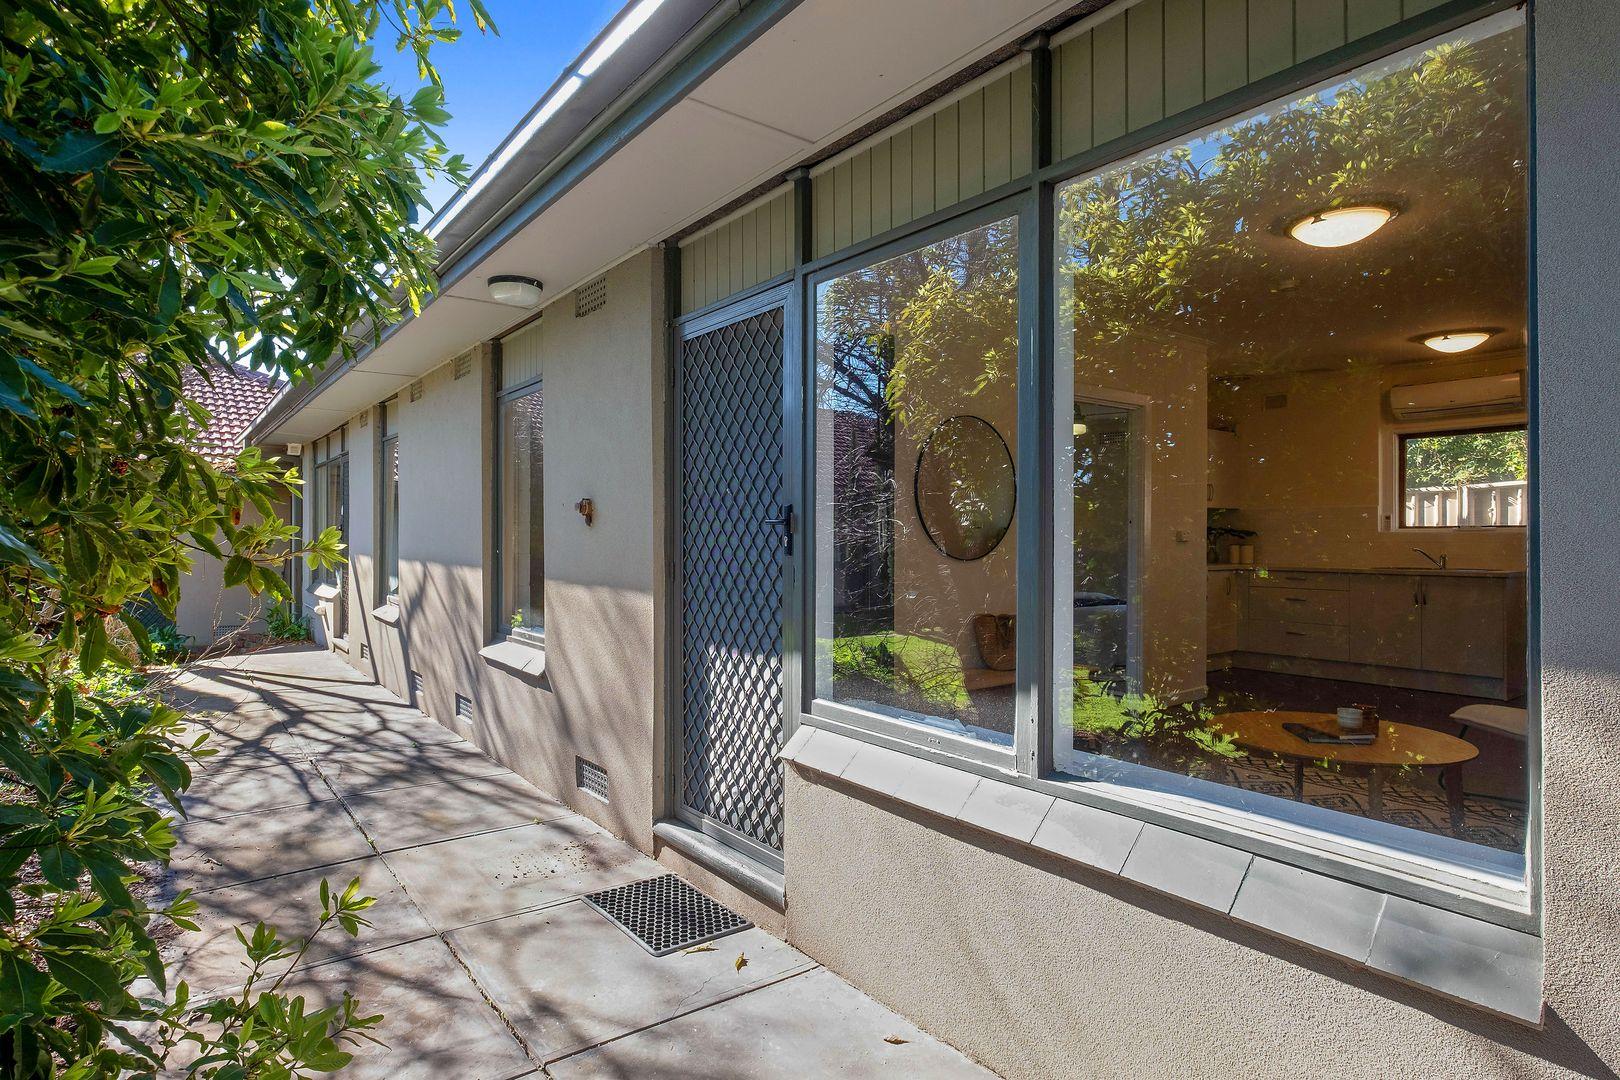 4/7 Martindale  Avenue, Toorak Gardens SA 5065, Image 1